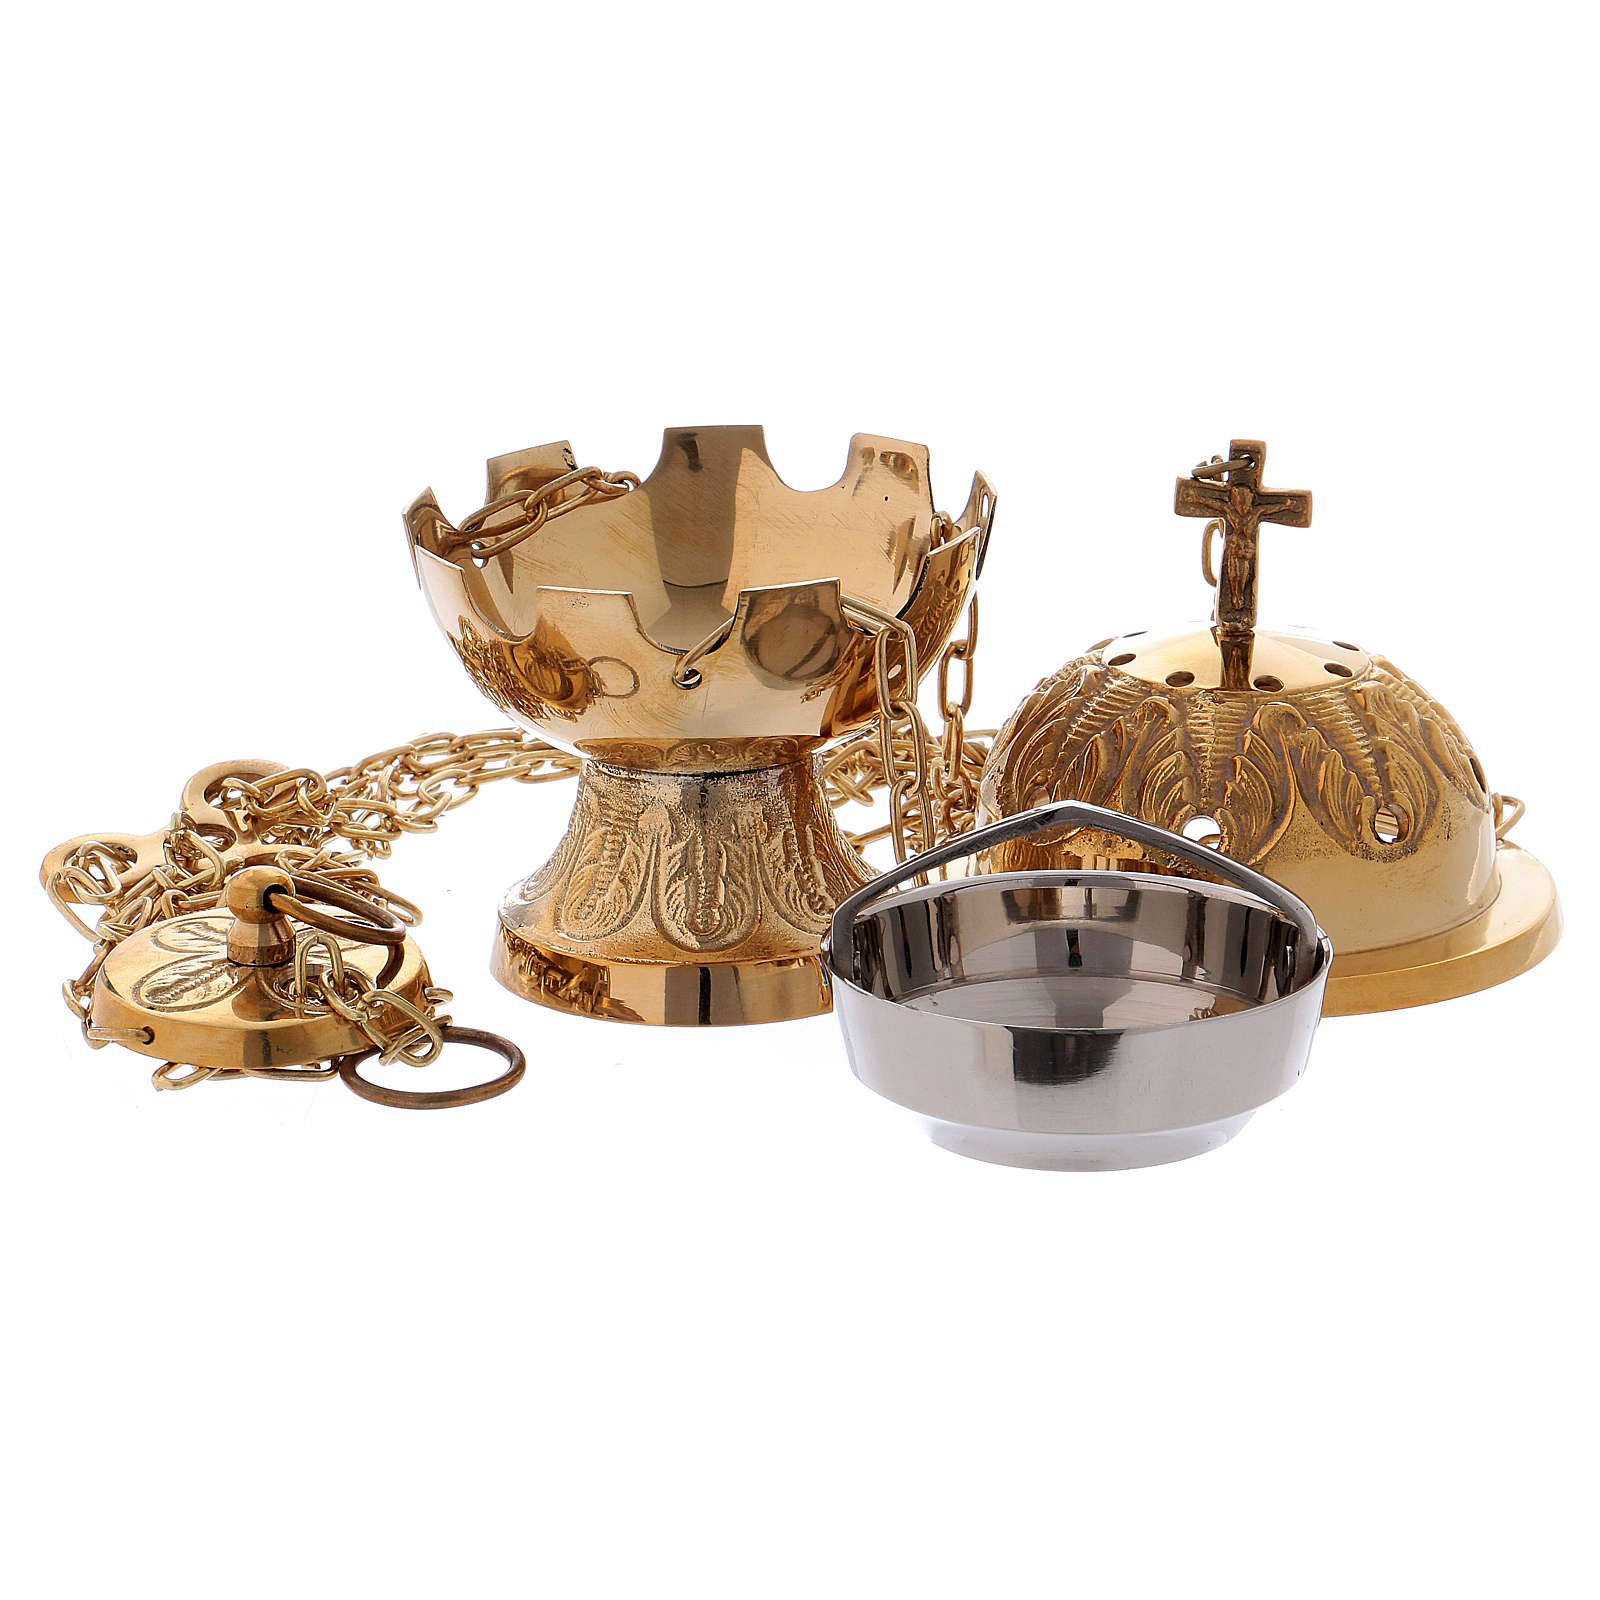 Incensario cincelado con cruz latón dorado 3